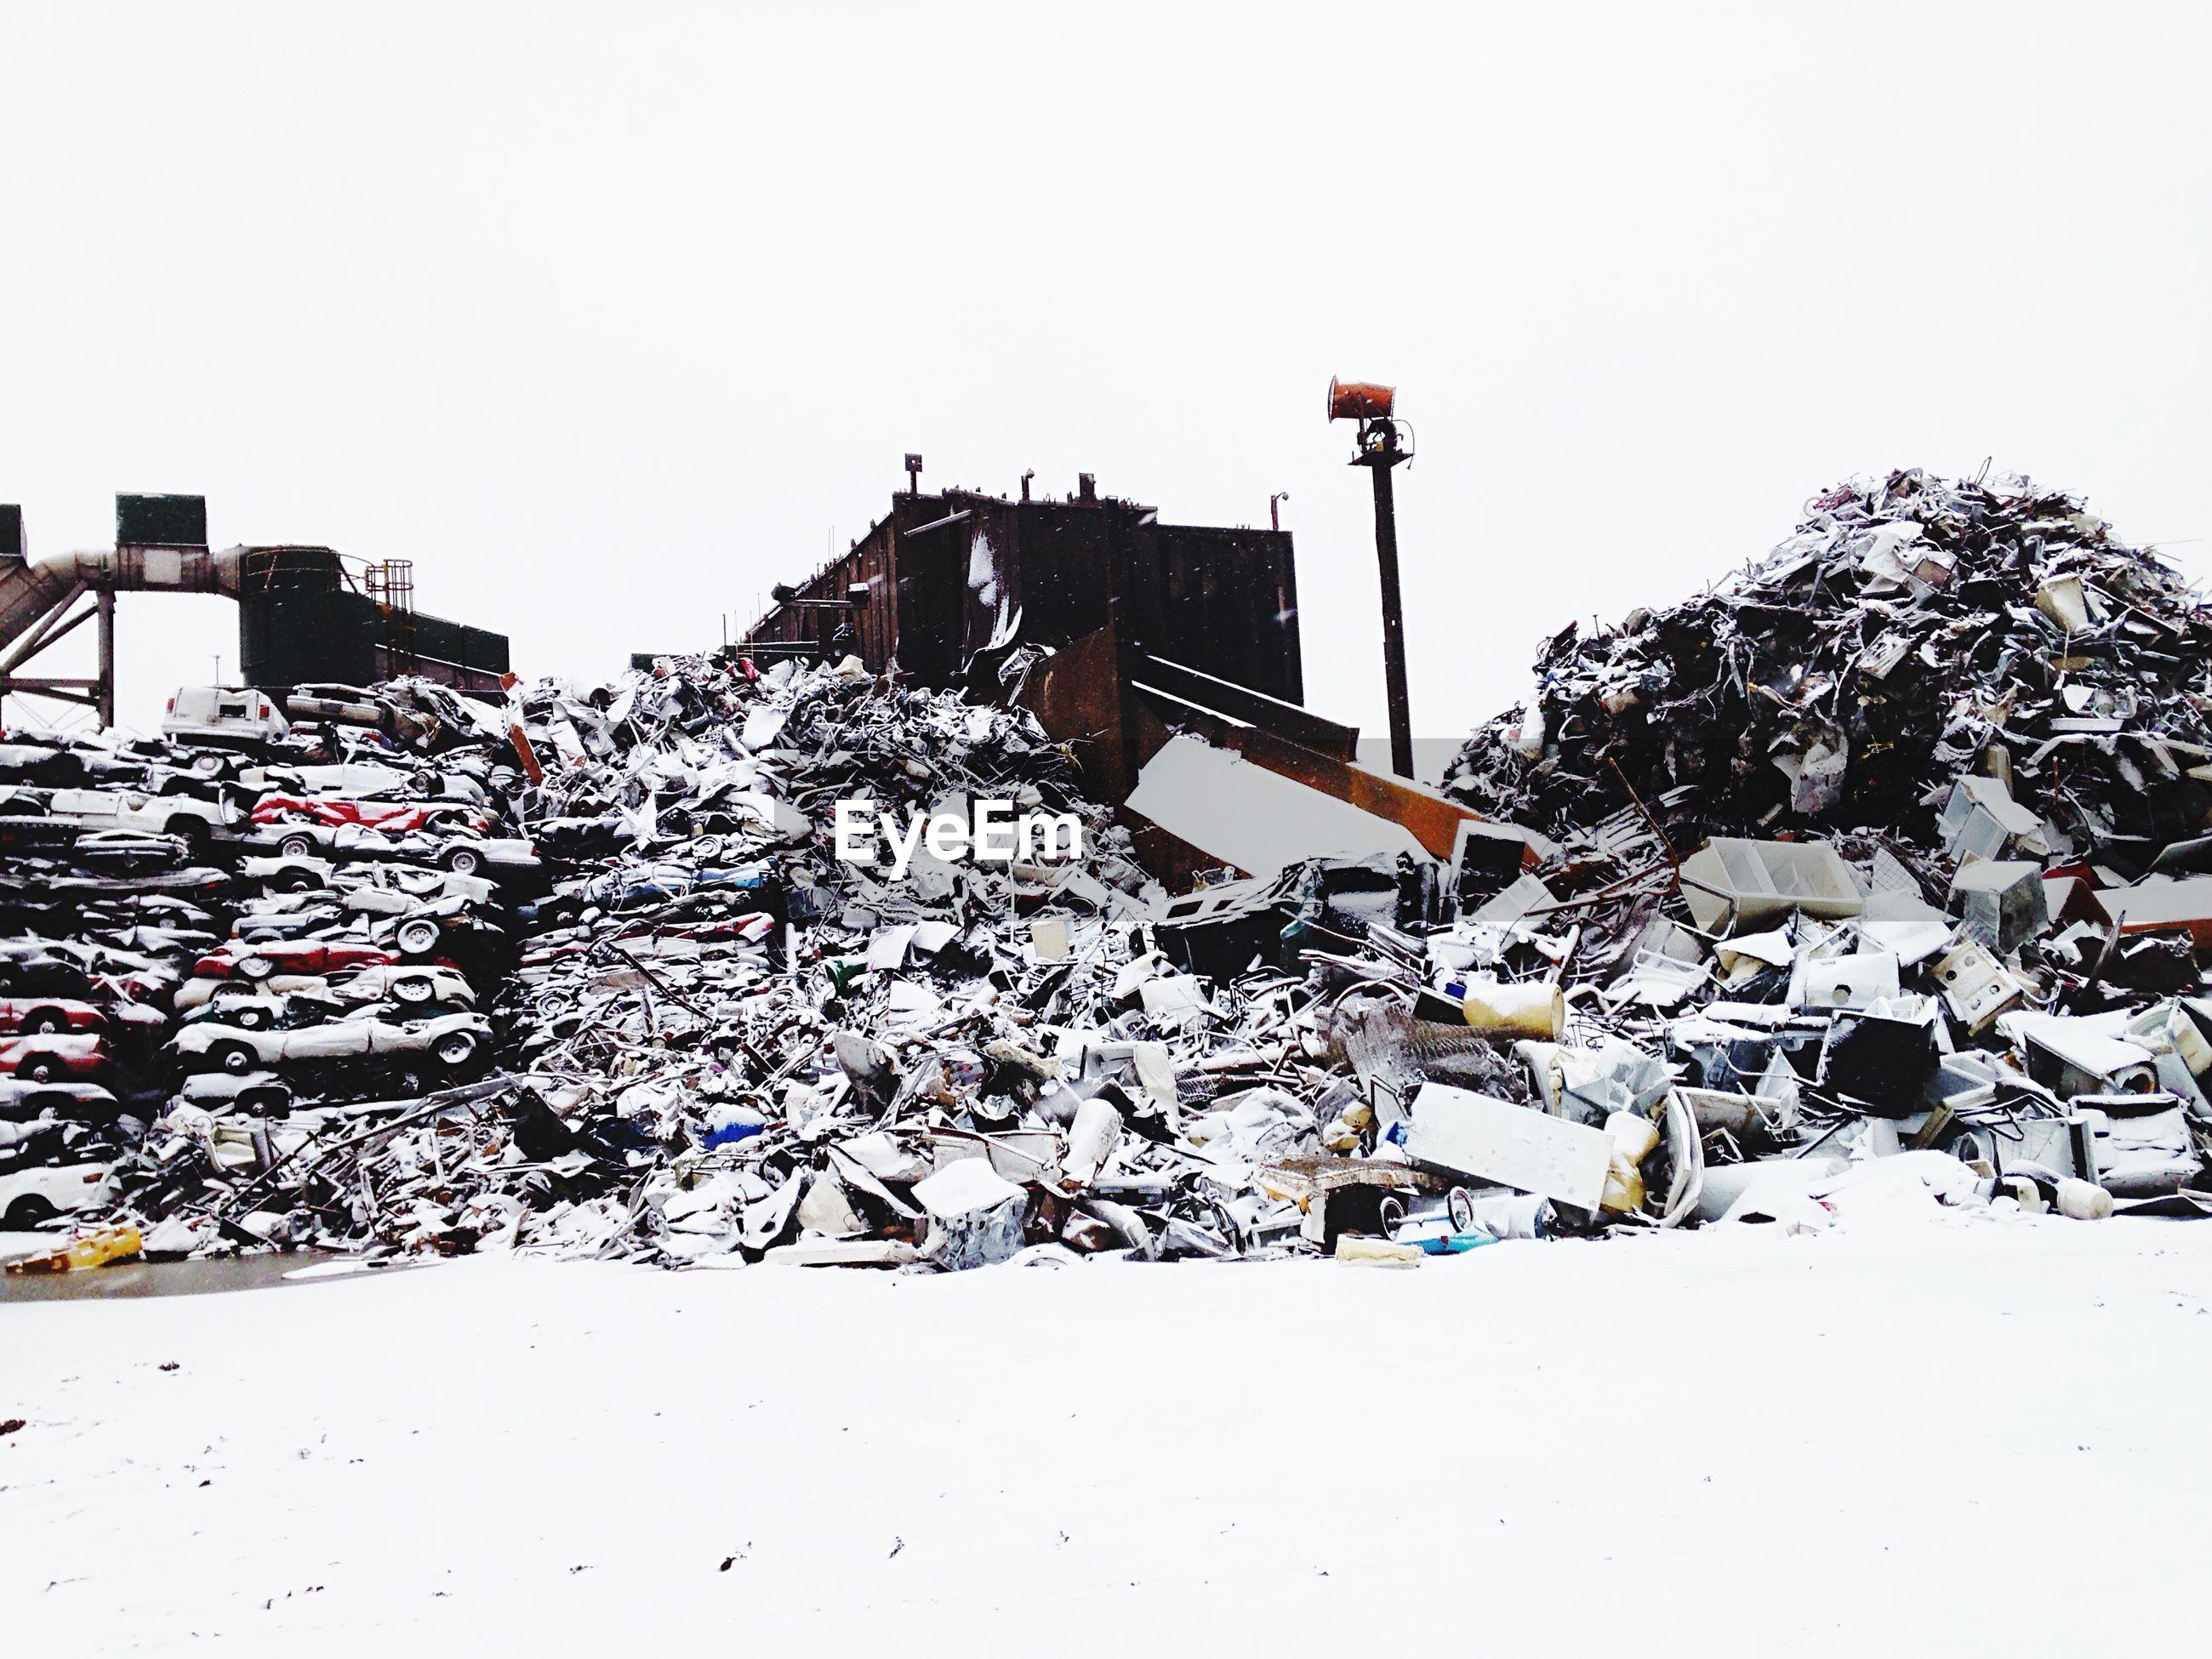 Snow covered junkyard against clear sky